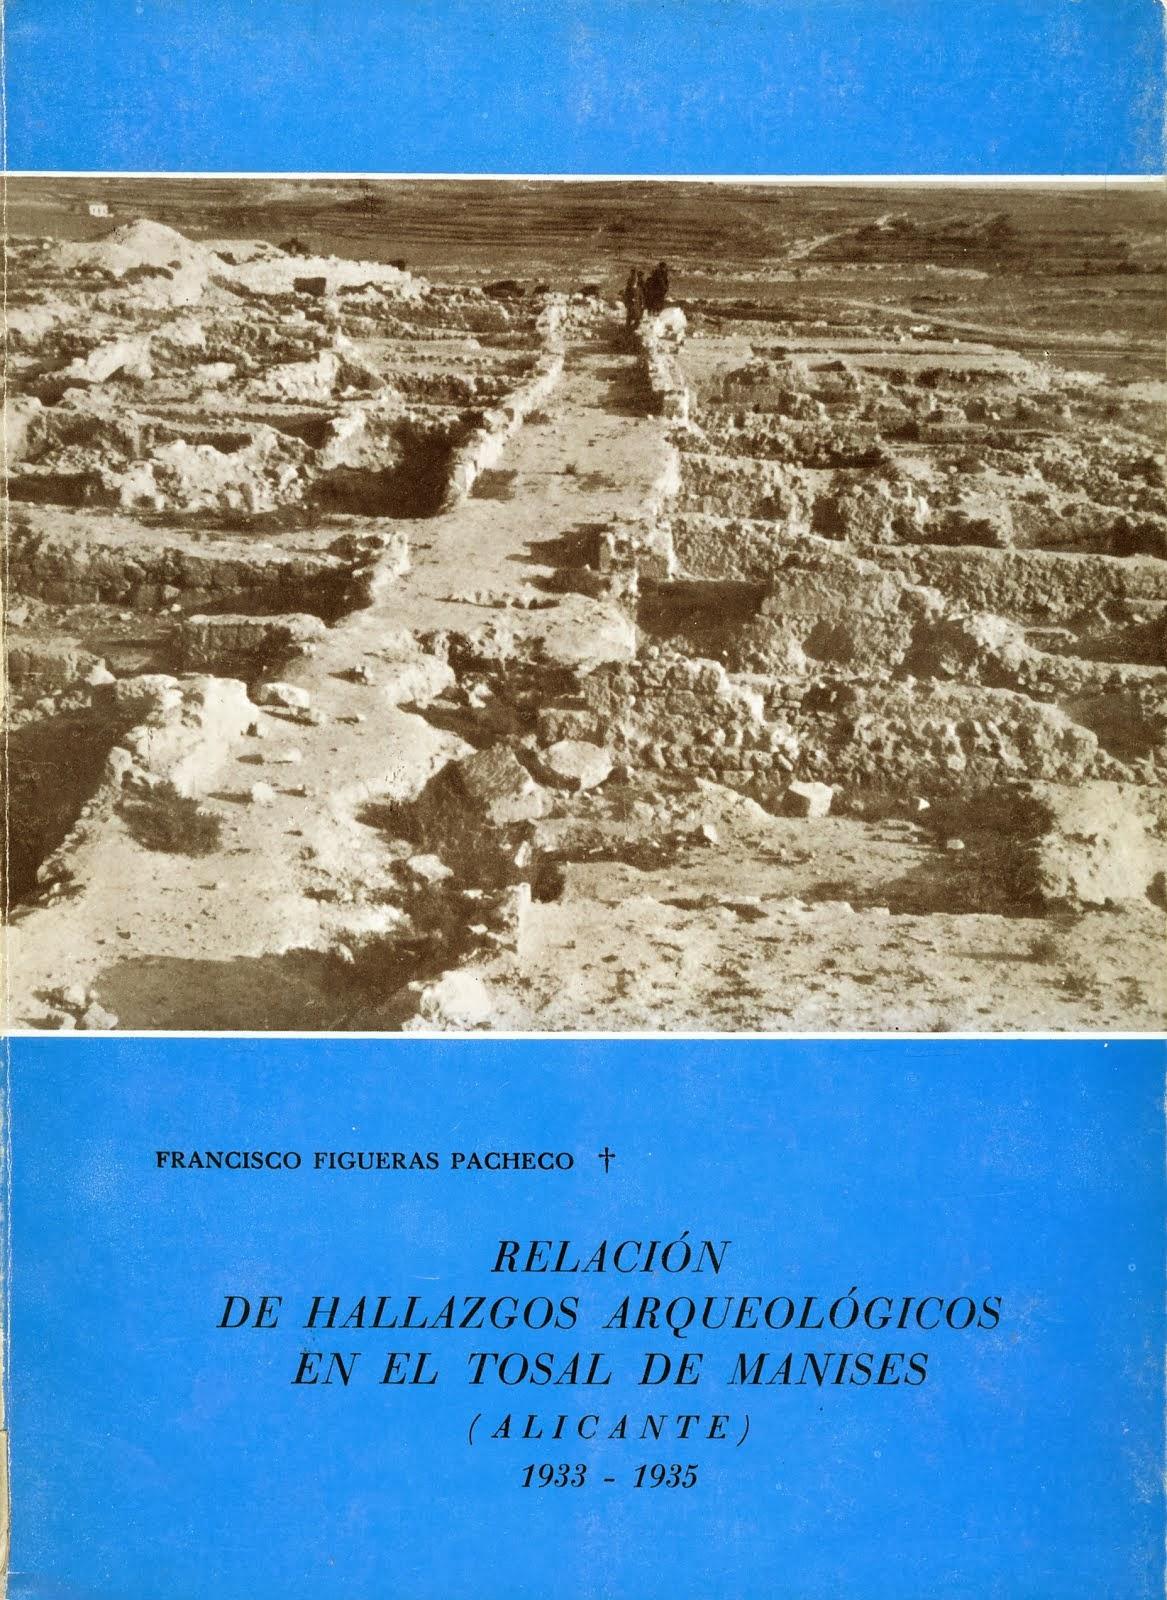 Relación de hallazgos arqueologicos